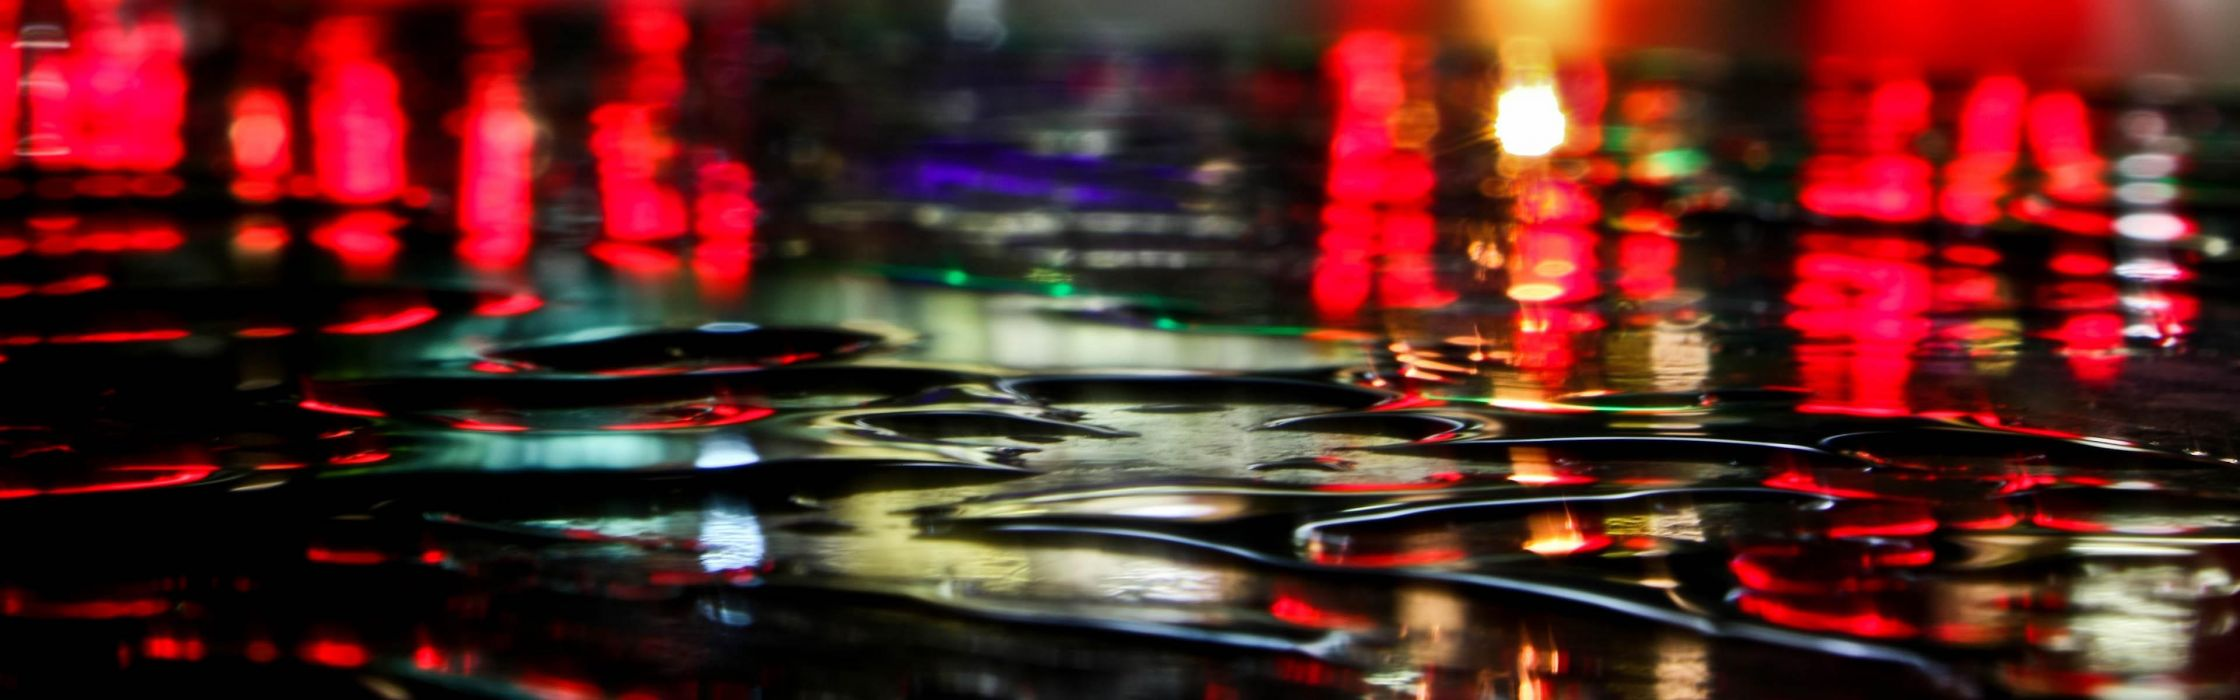 Urban water drops multiscreen wallpaper